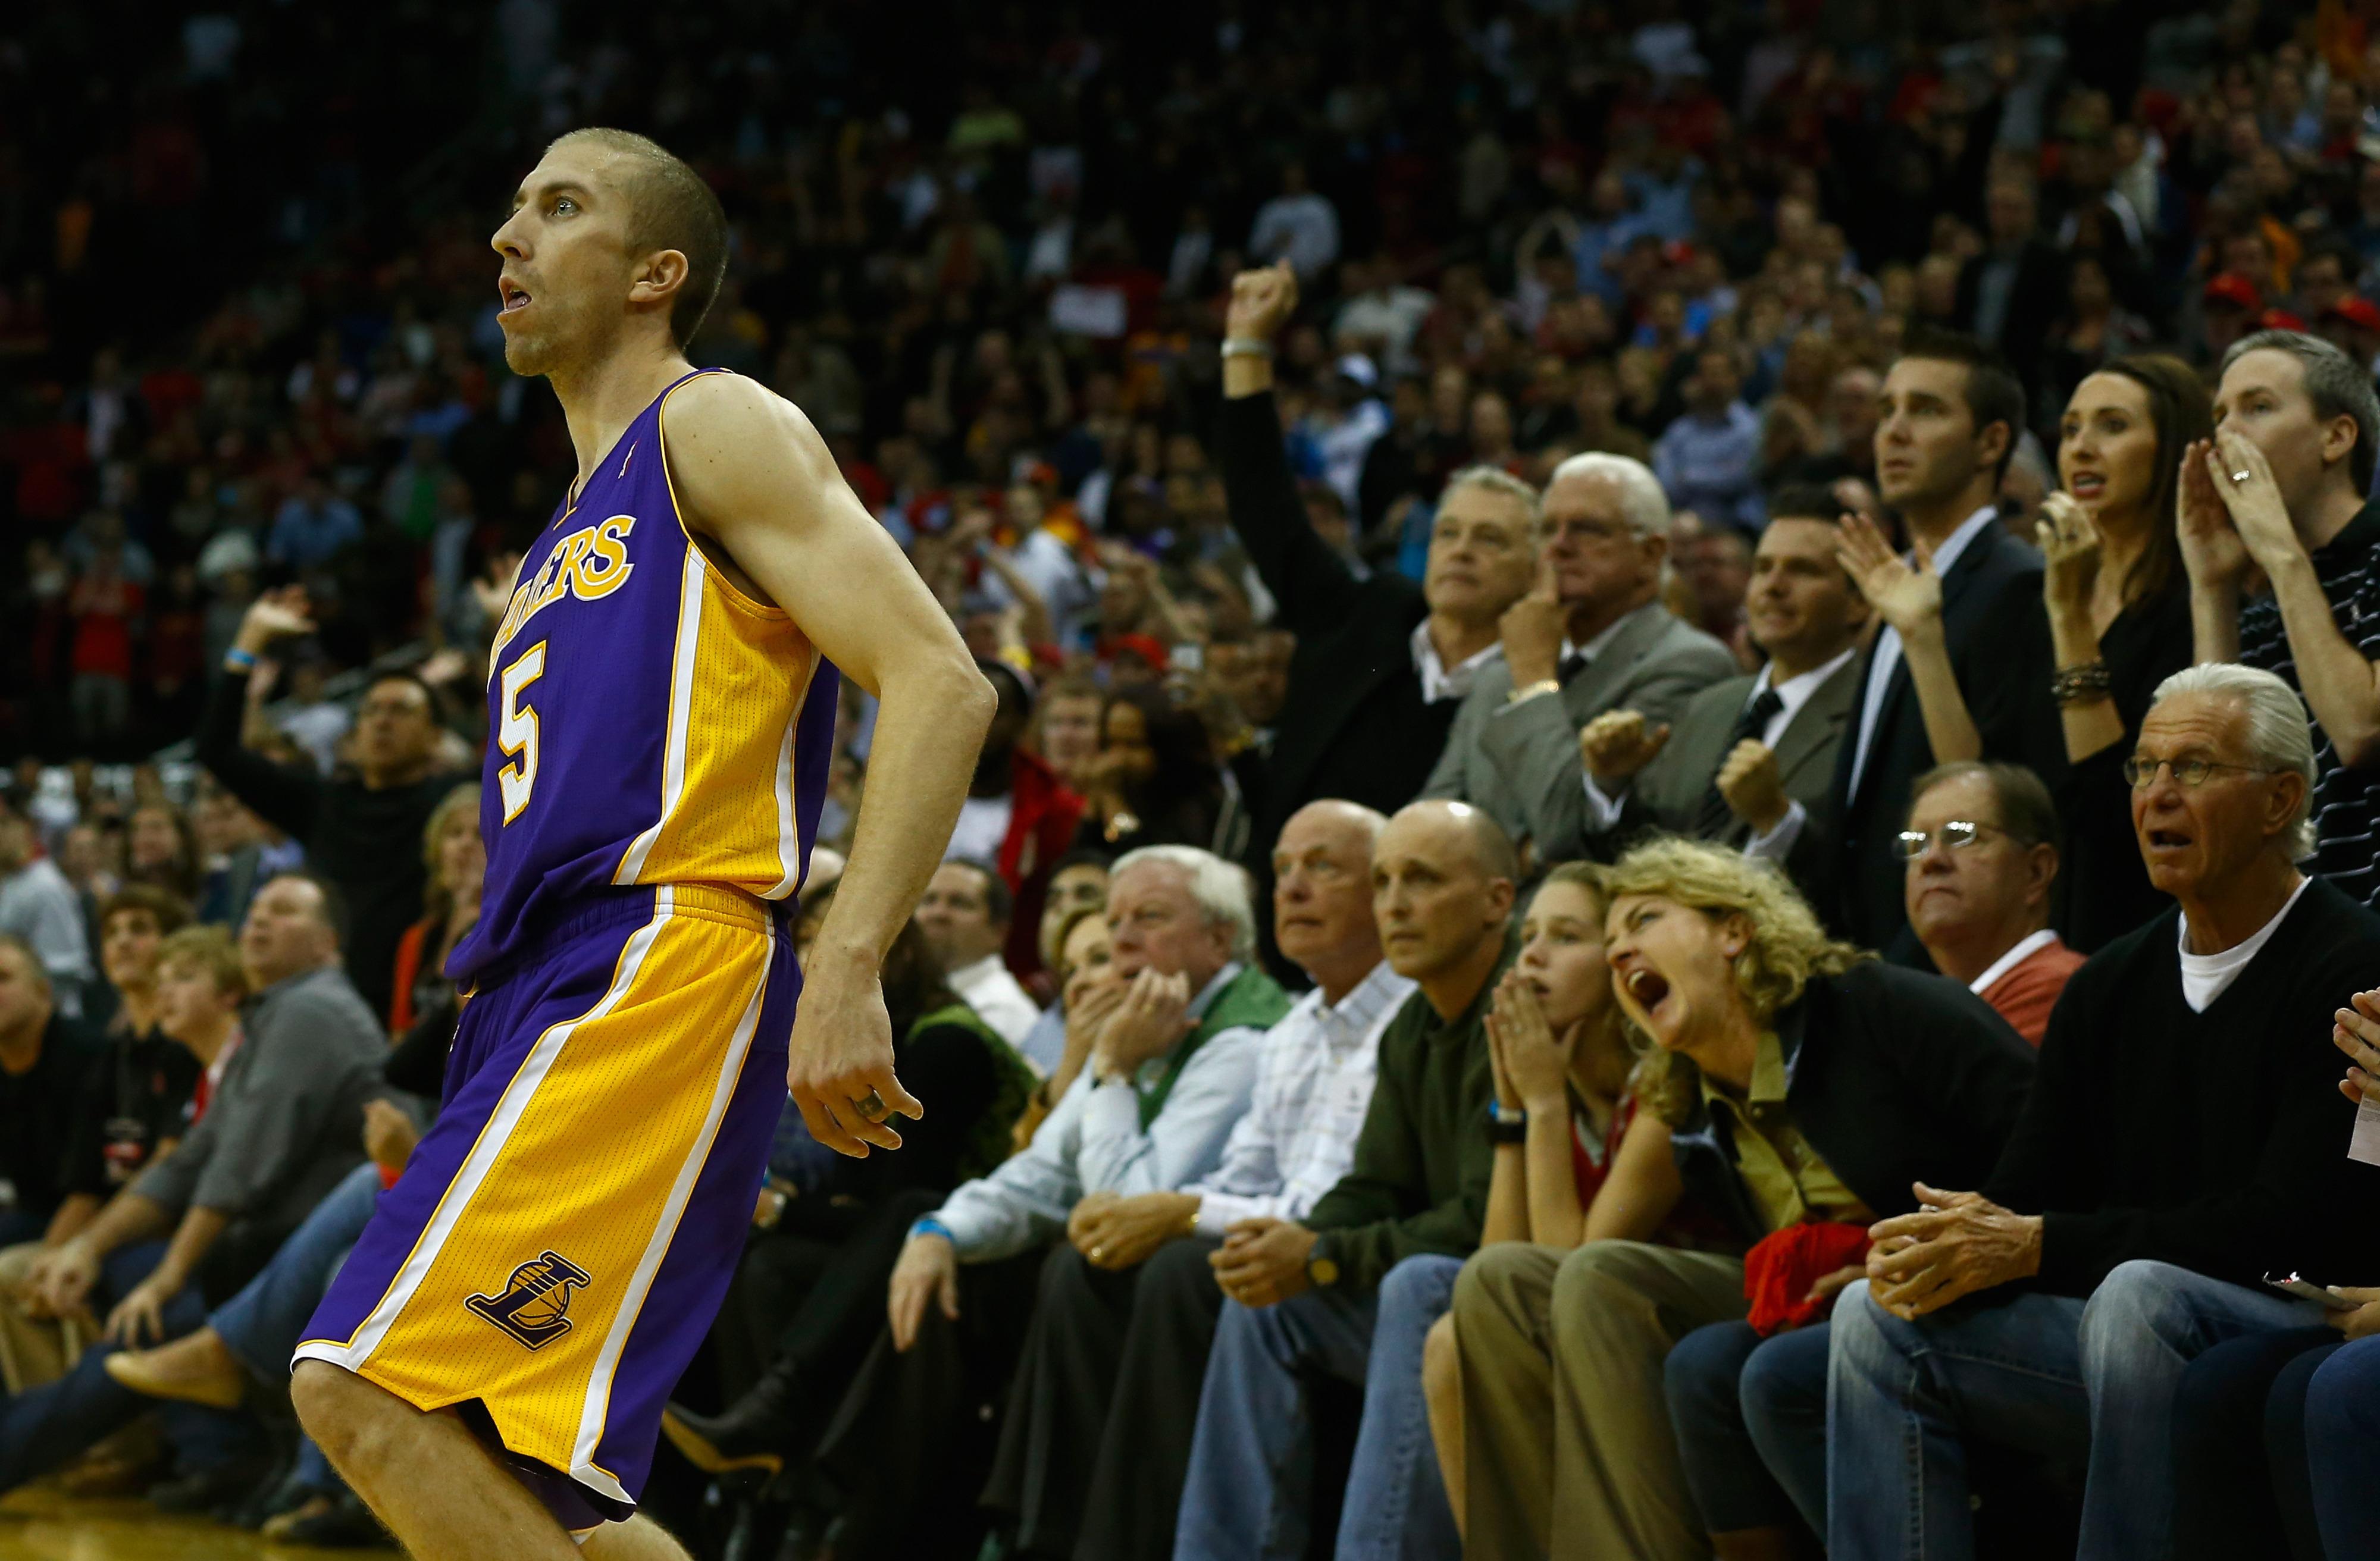 Lakers beat Rockets on Steve Blake game-winner, 99-98